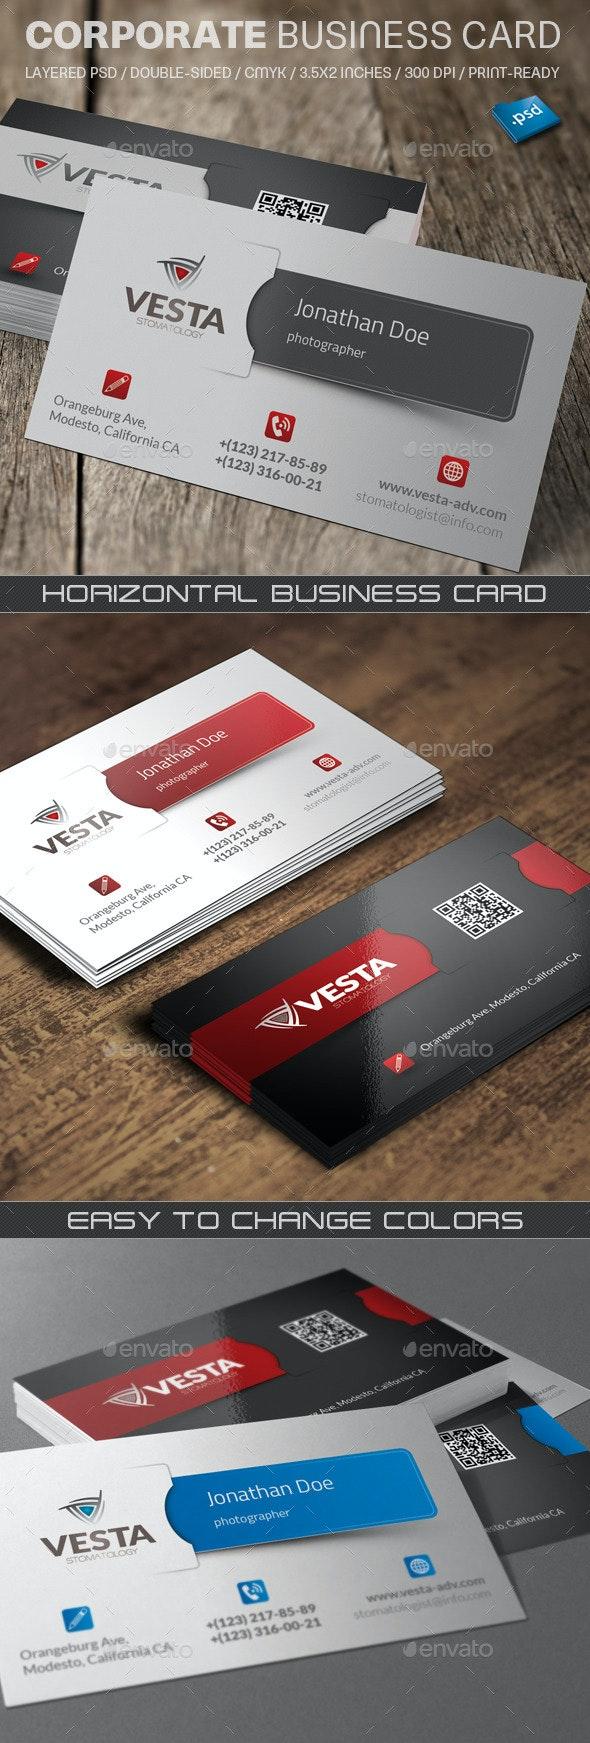 Corporate Business Card V760 - Corporate Business Cards